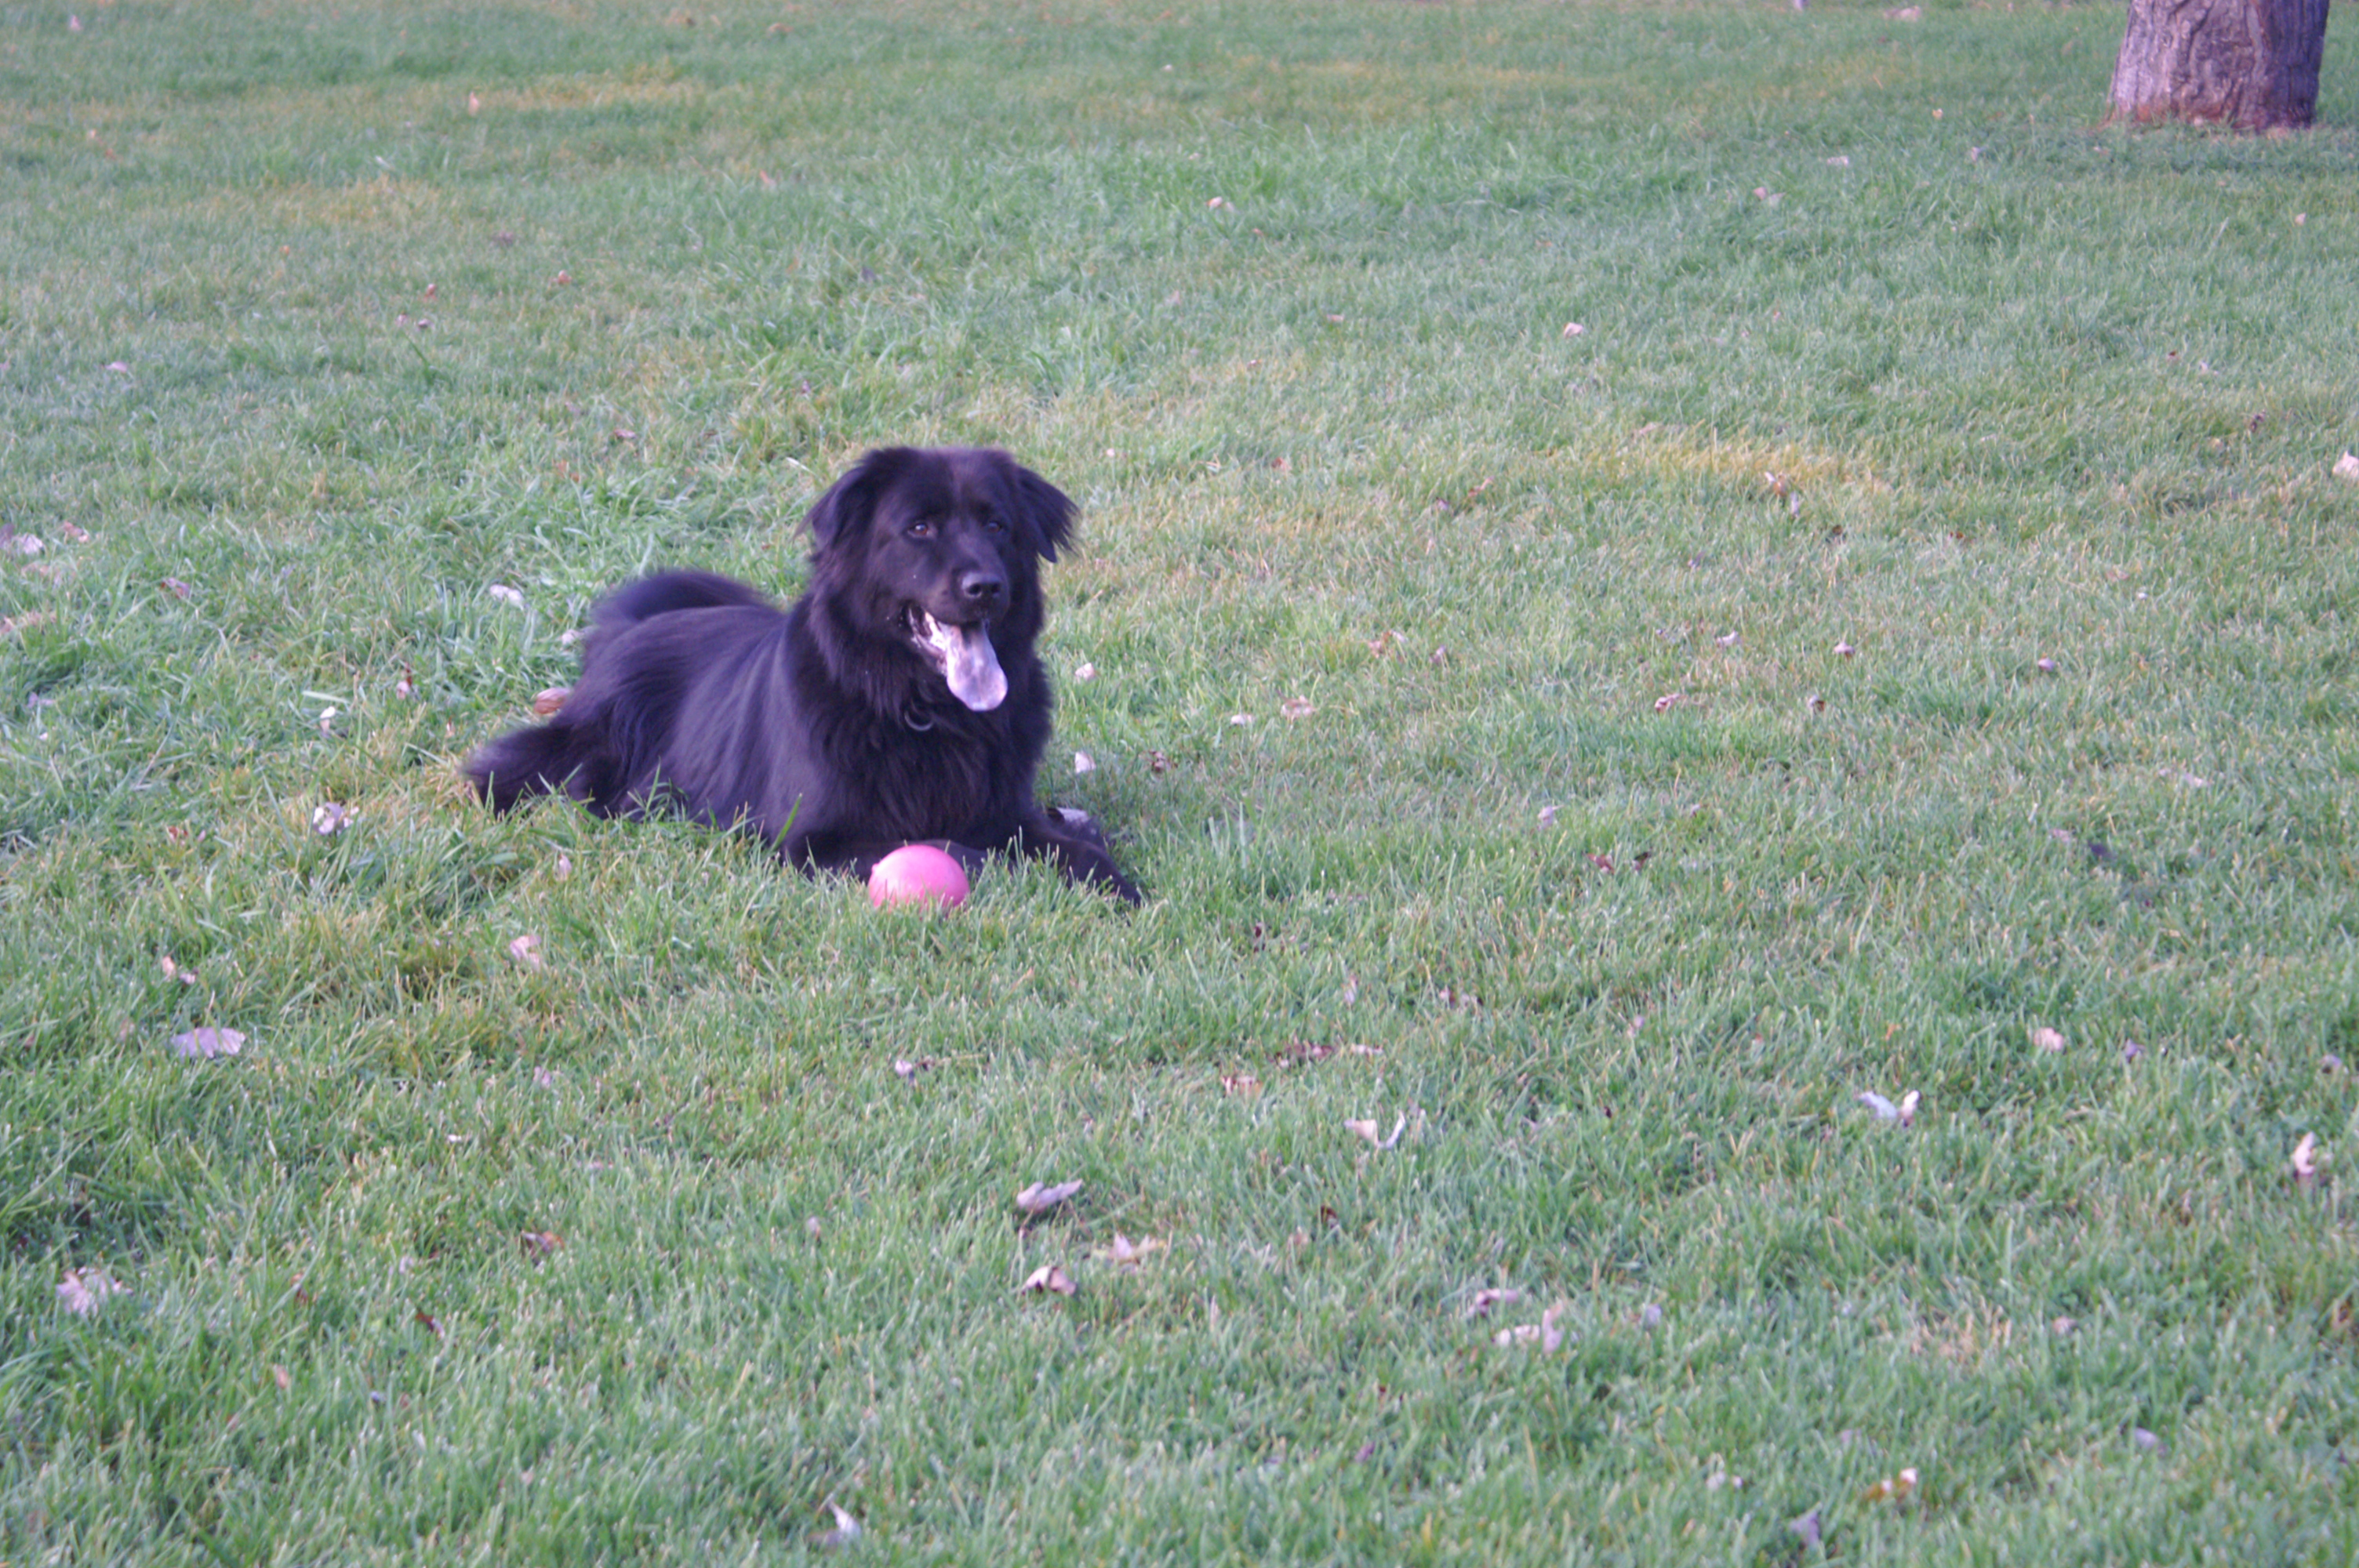 Our dog Lucas.